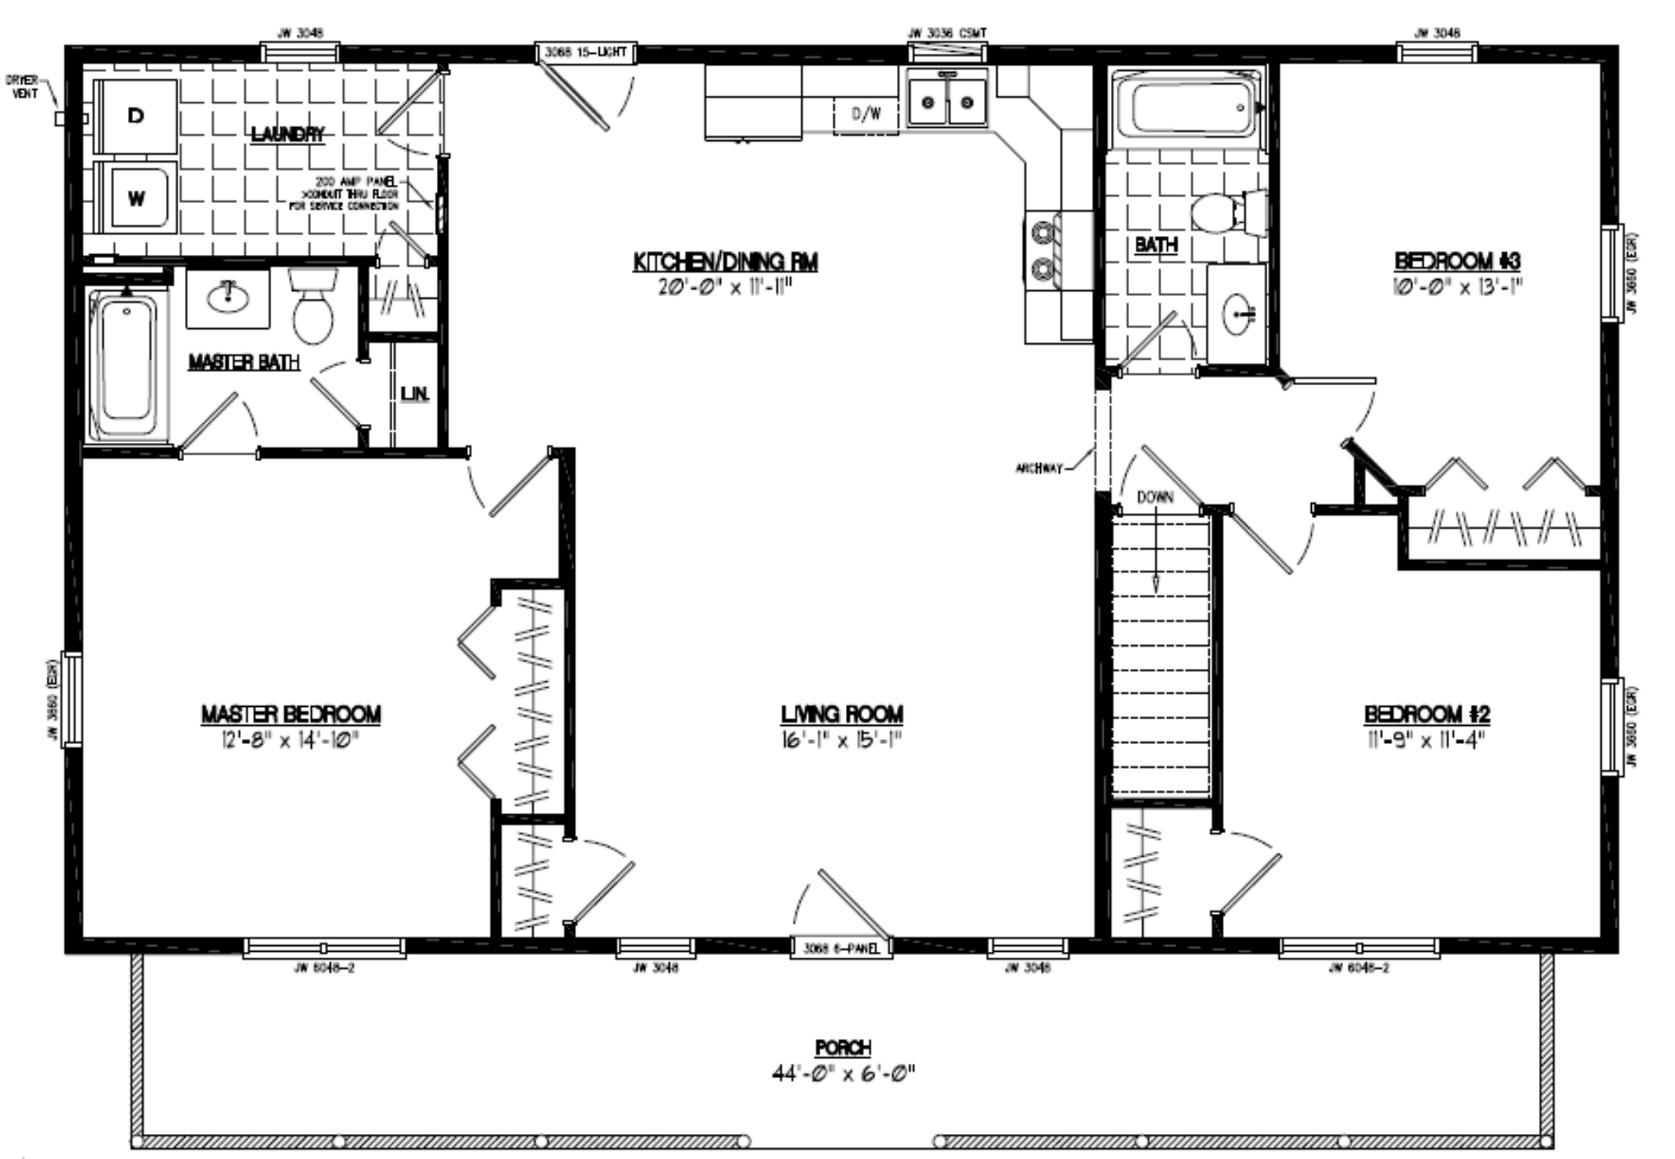 py8isiwwjfak6xdah5i7wgesdppid151home plansoakwood homes design - Oakwood Homes Design Center